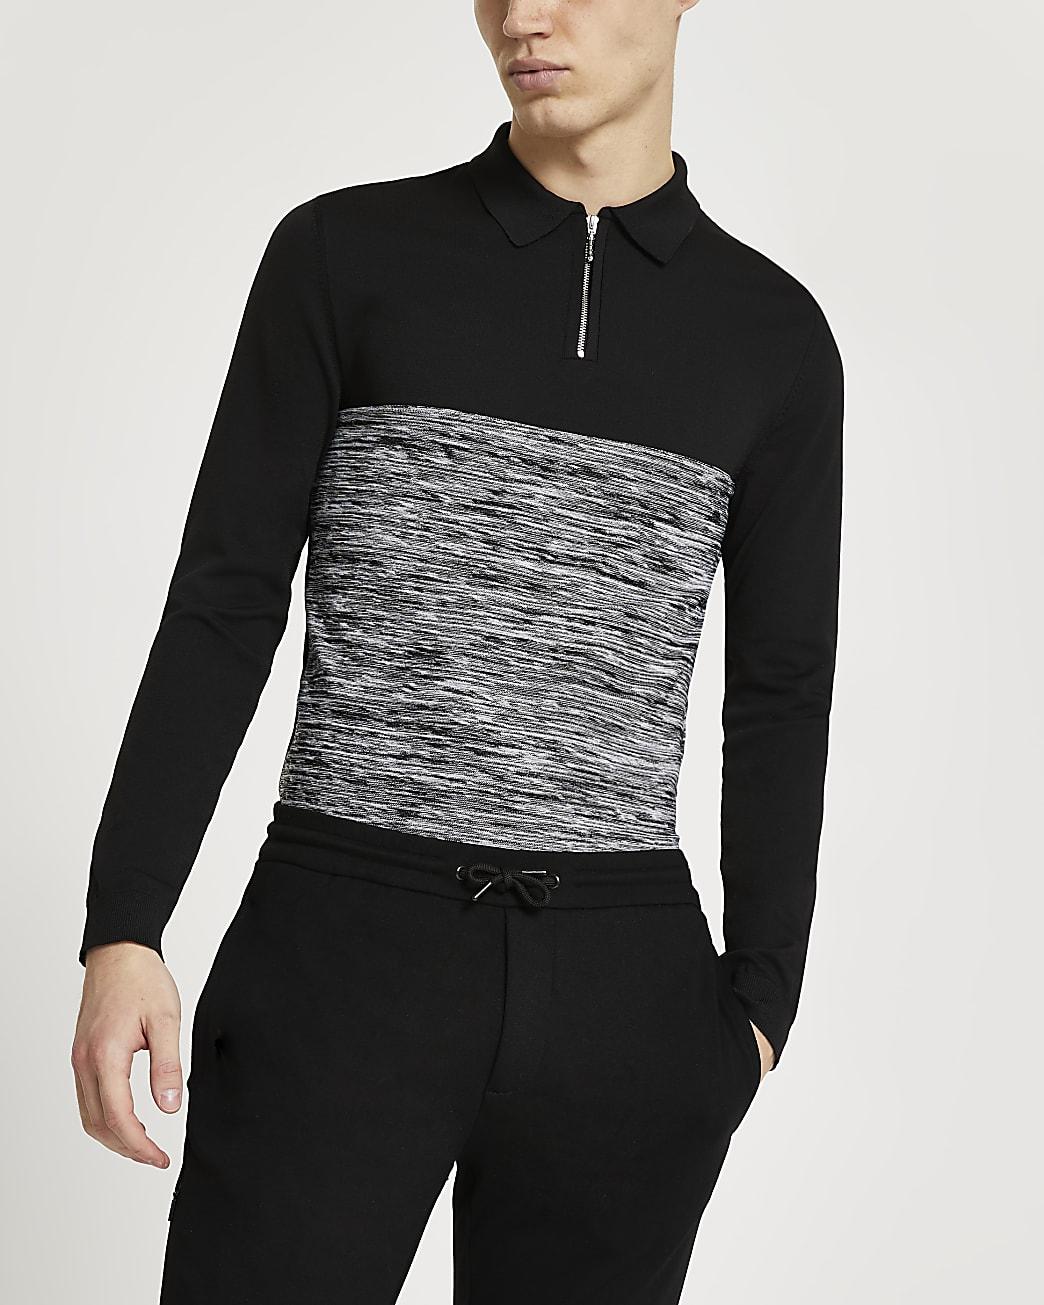 Black spacedye muscle fit long sleeve polo